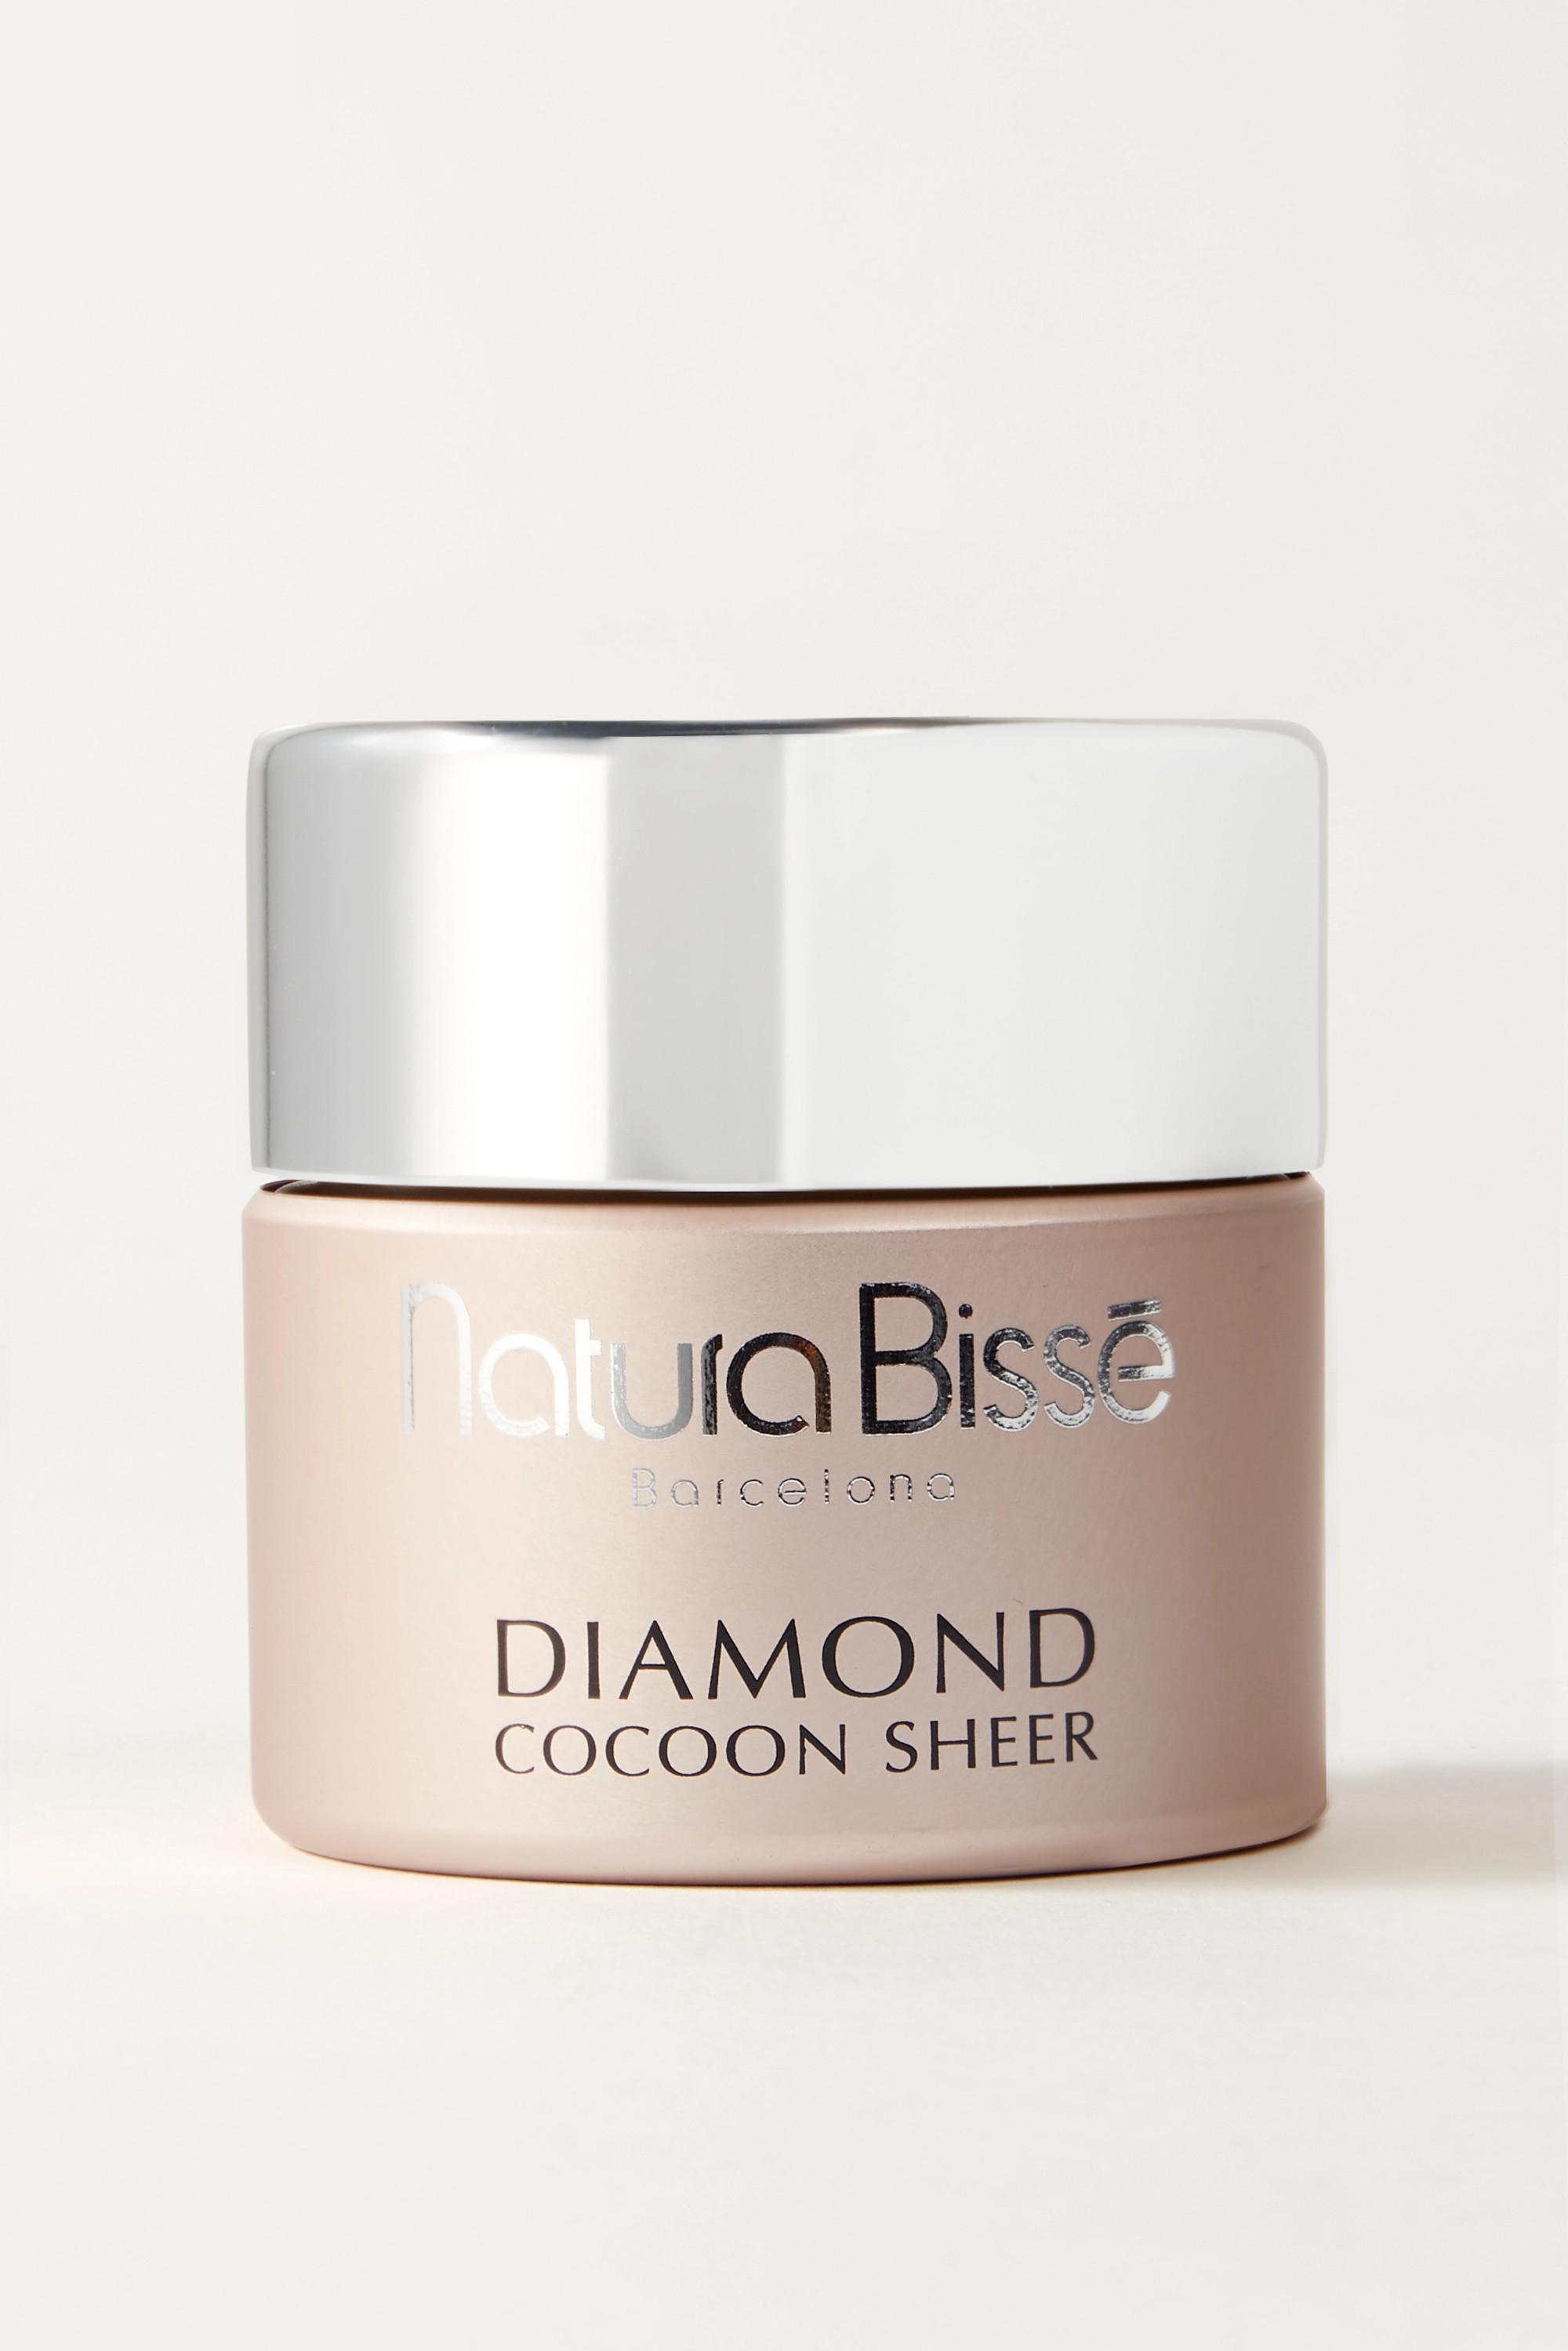 Natura Bissé Diamond Cocoon Sheer Cream, 50ml